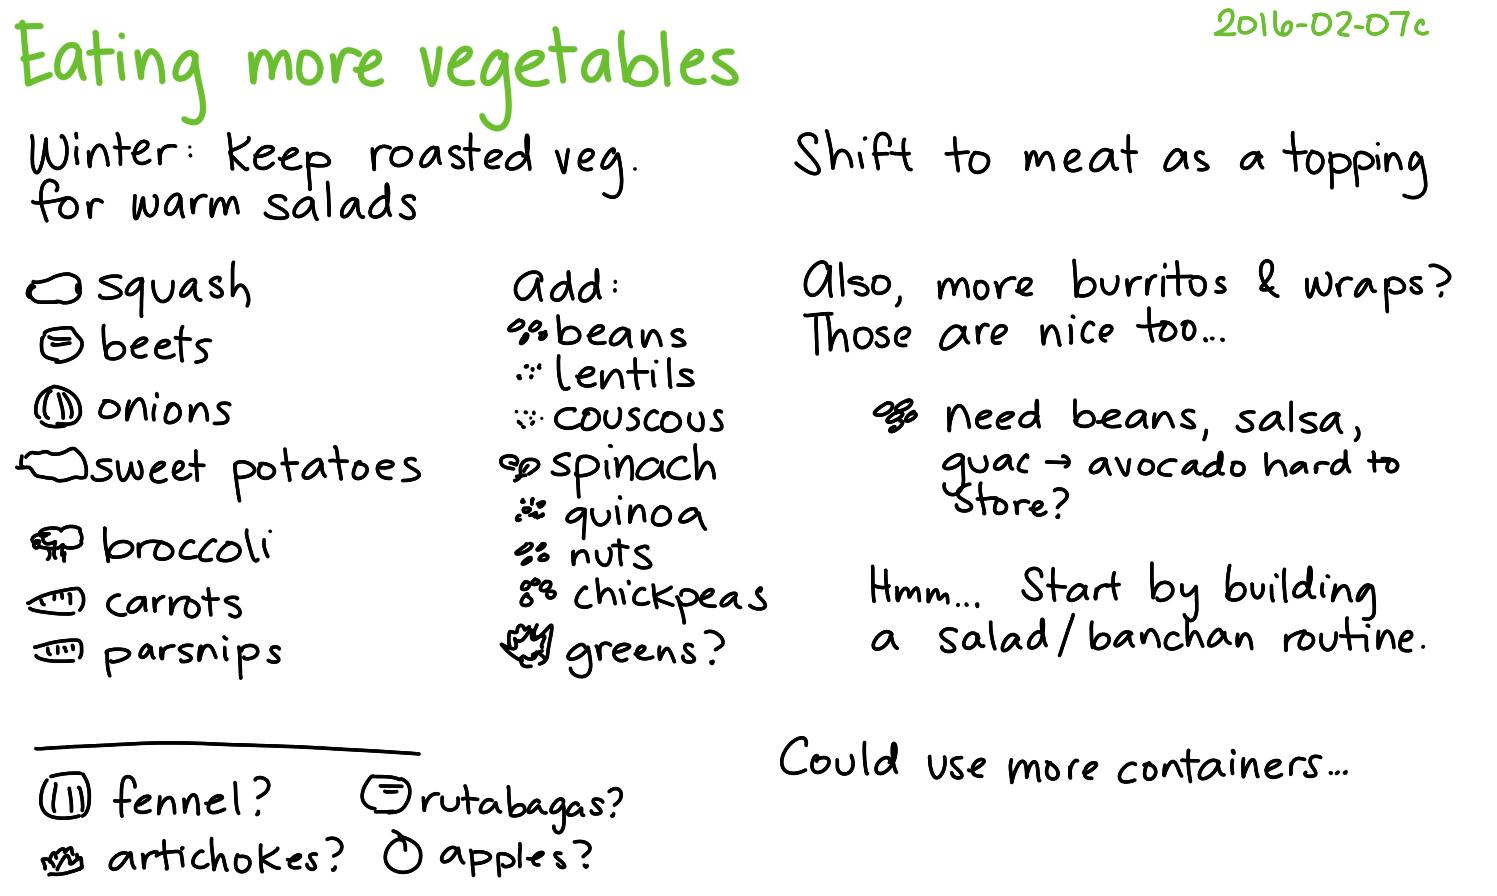 Worksheets How To Eat Fried Worms Worksheets 2016 02 07c eating more vegetables index card cooking png vegetables